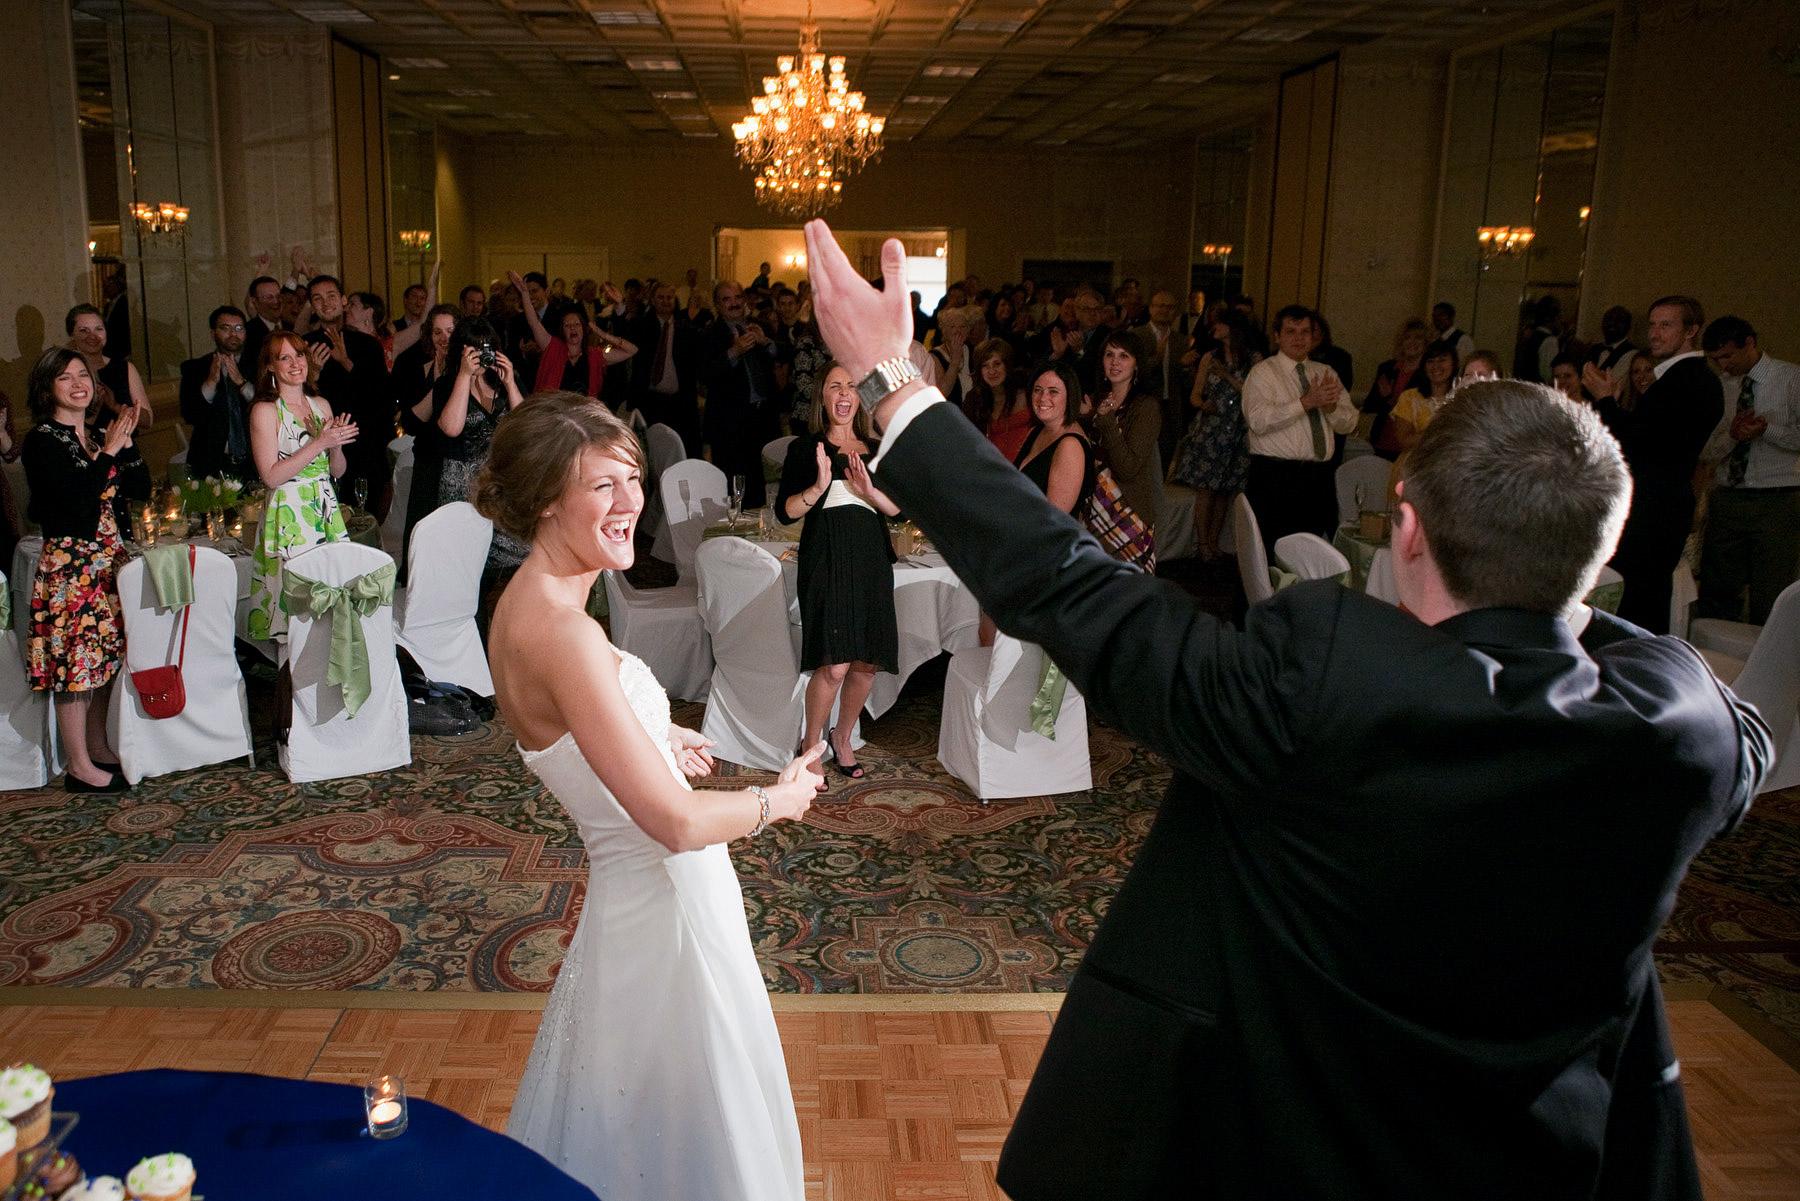 wedding-photography-saint-paul-mark-kegans-607.jpg